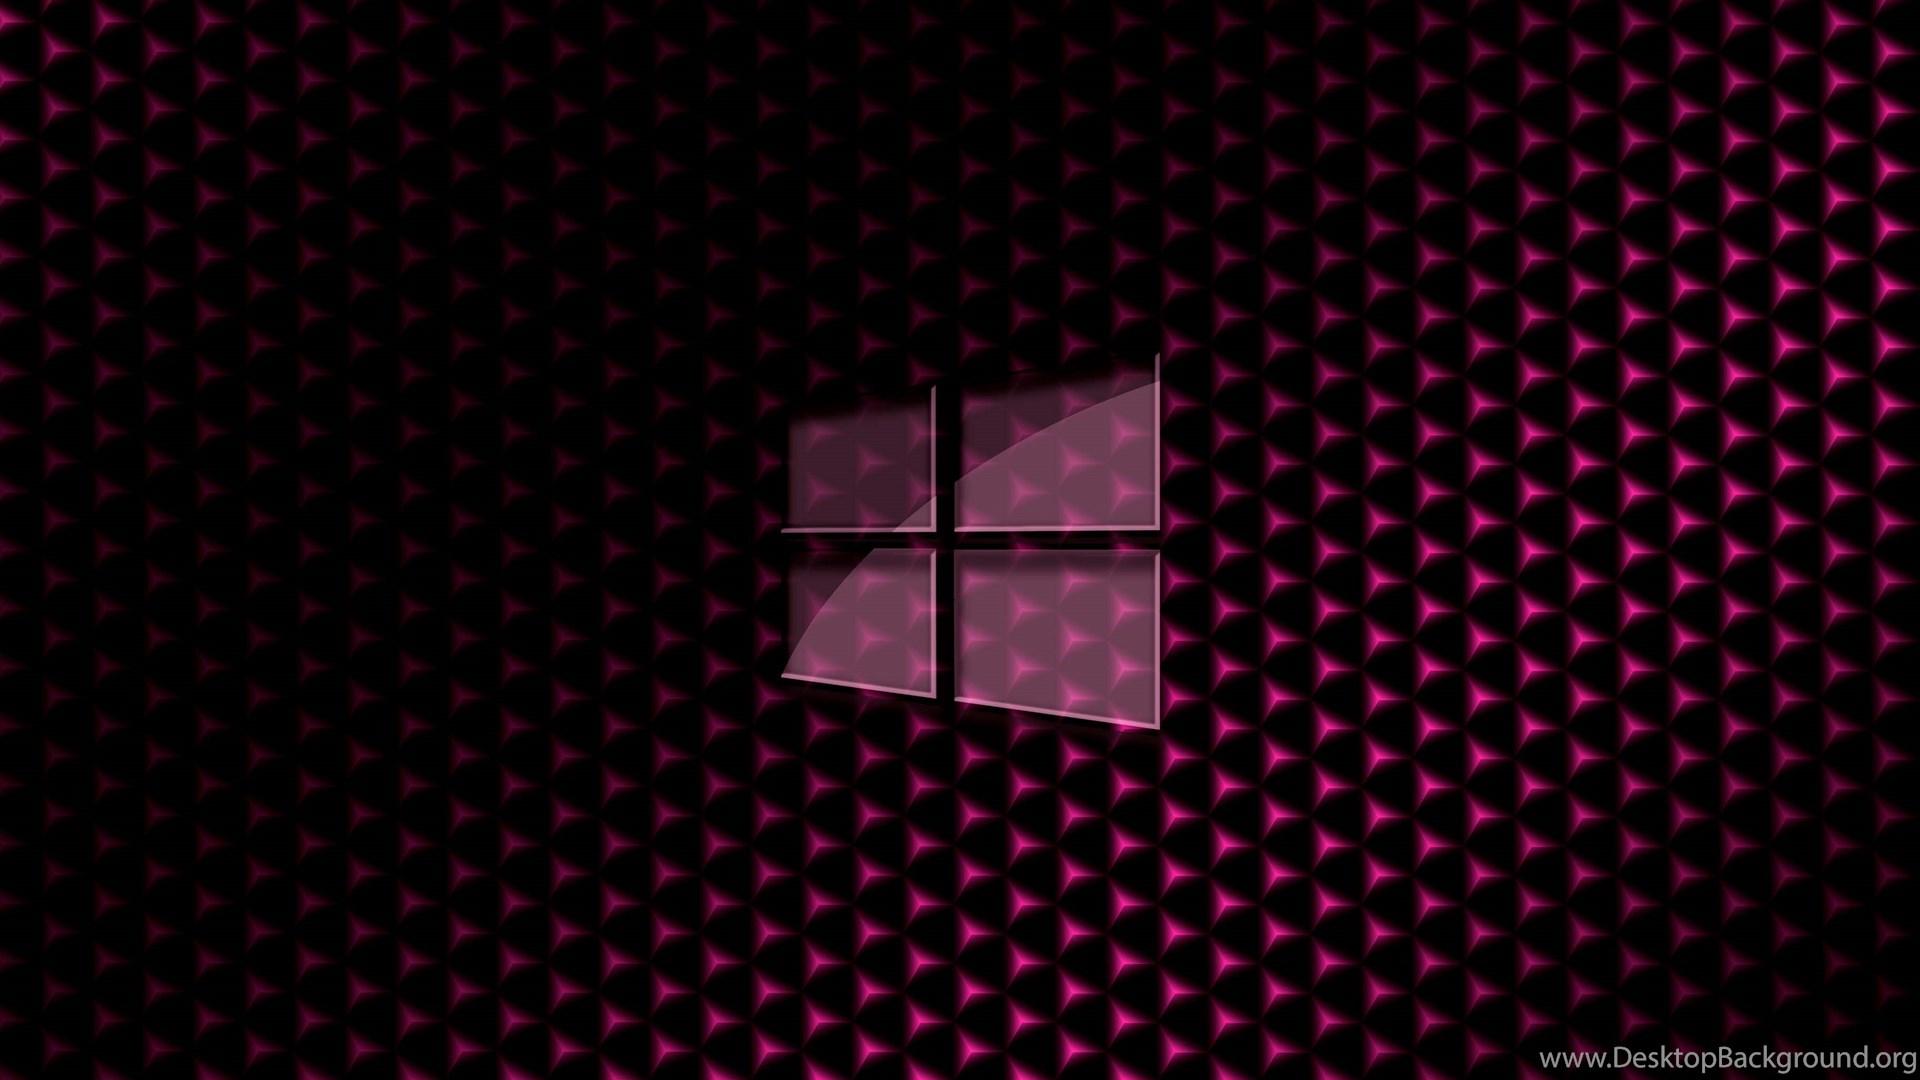 Abstract Wallpaper: Windows Carbon Fiber Desktop